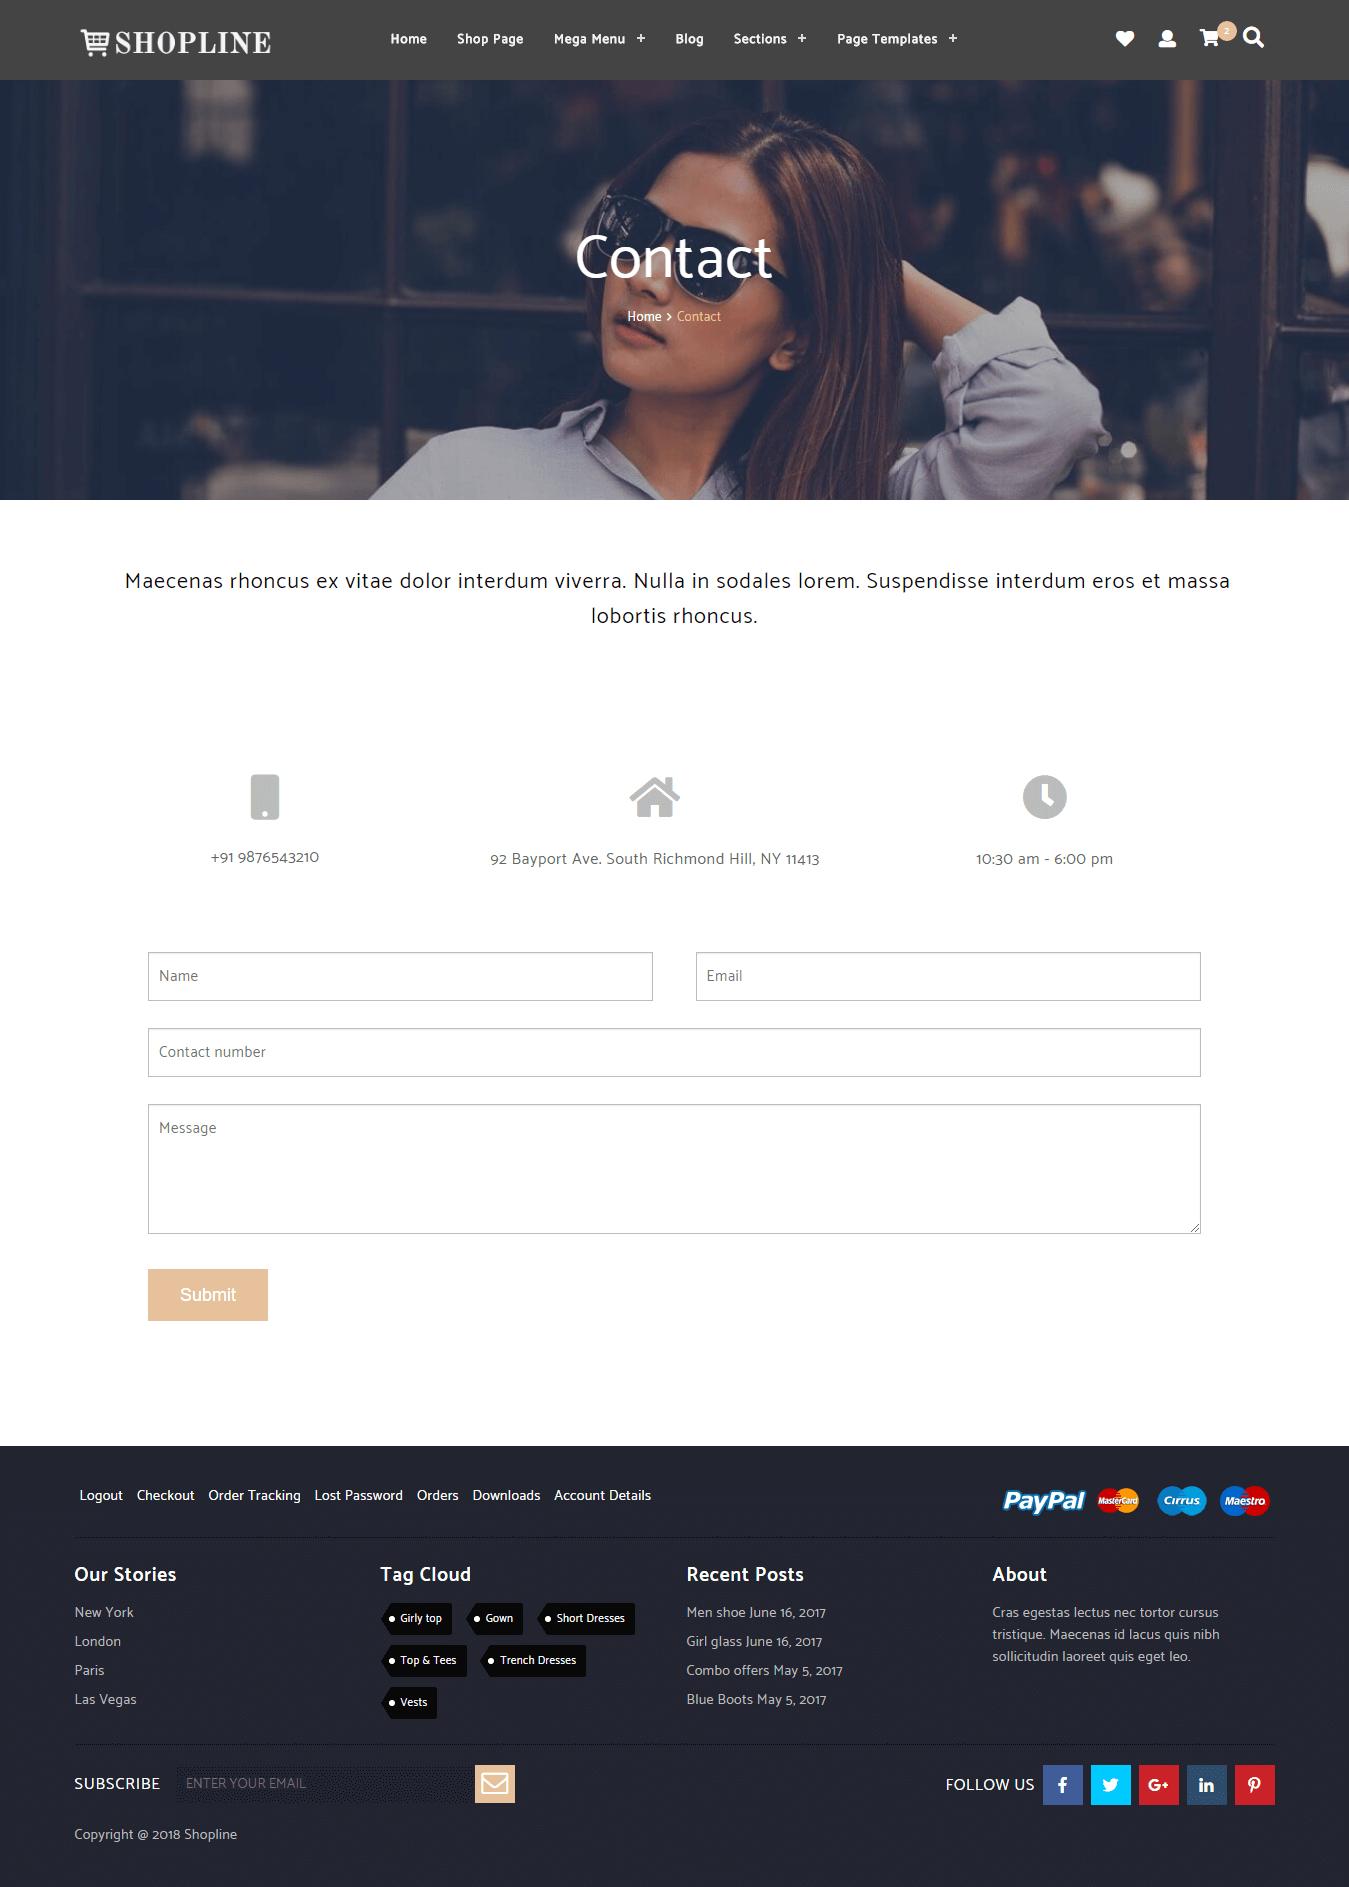 Shopline Pro Contact Layout